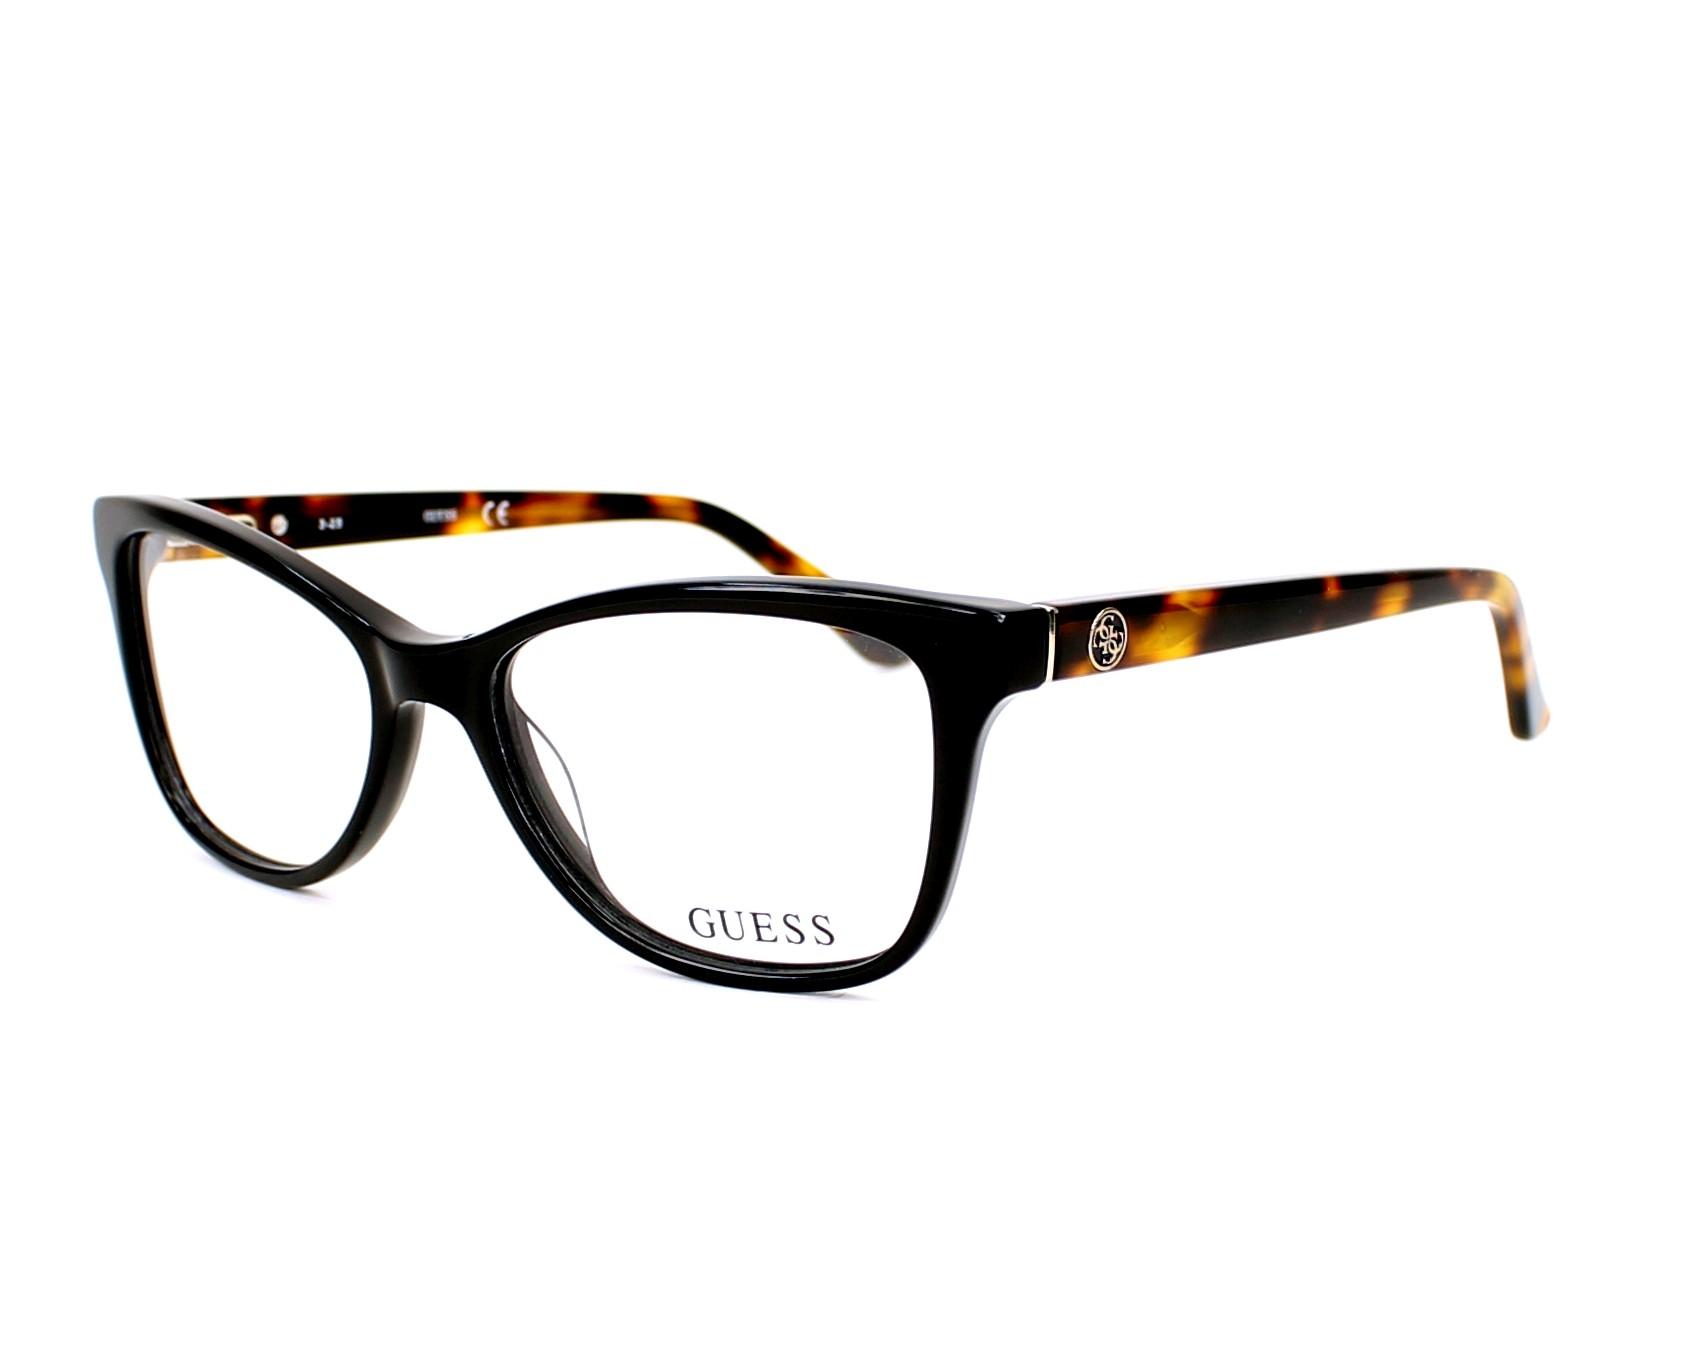 Guess Eyeglasses GU-2536 001 Black | visio-net.co.uk